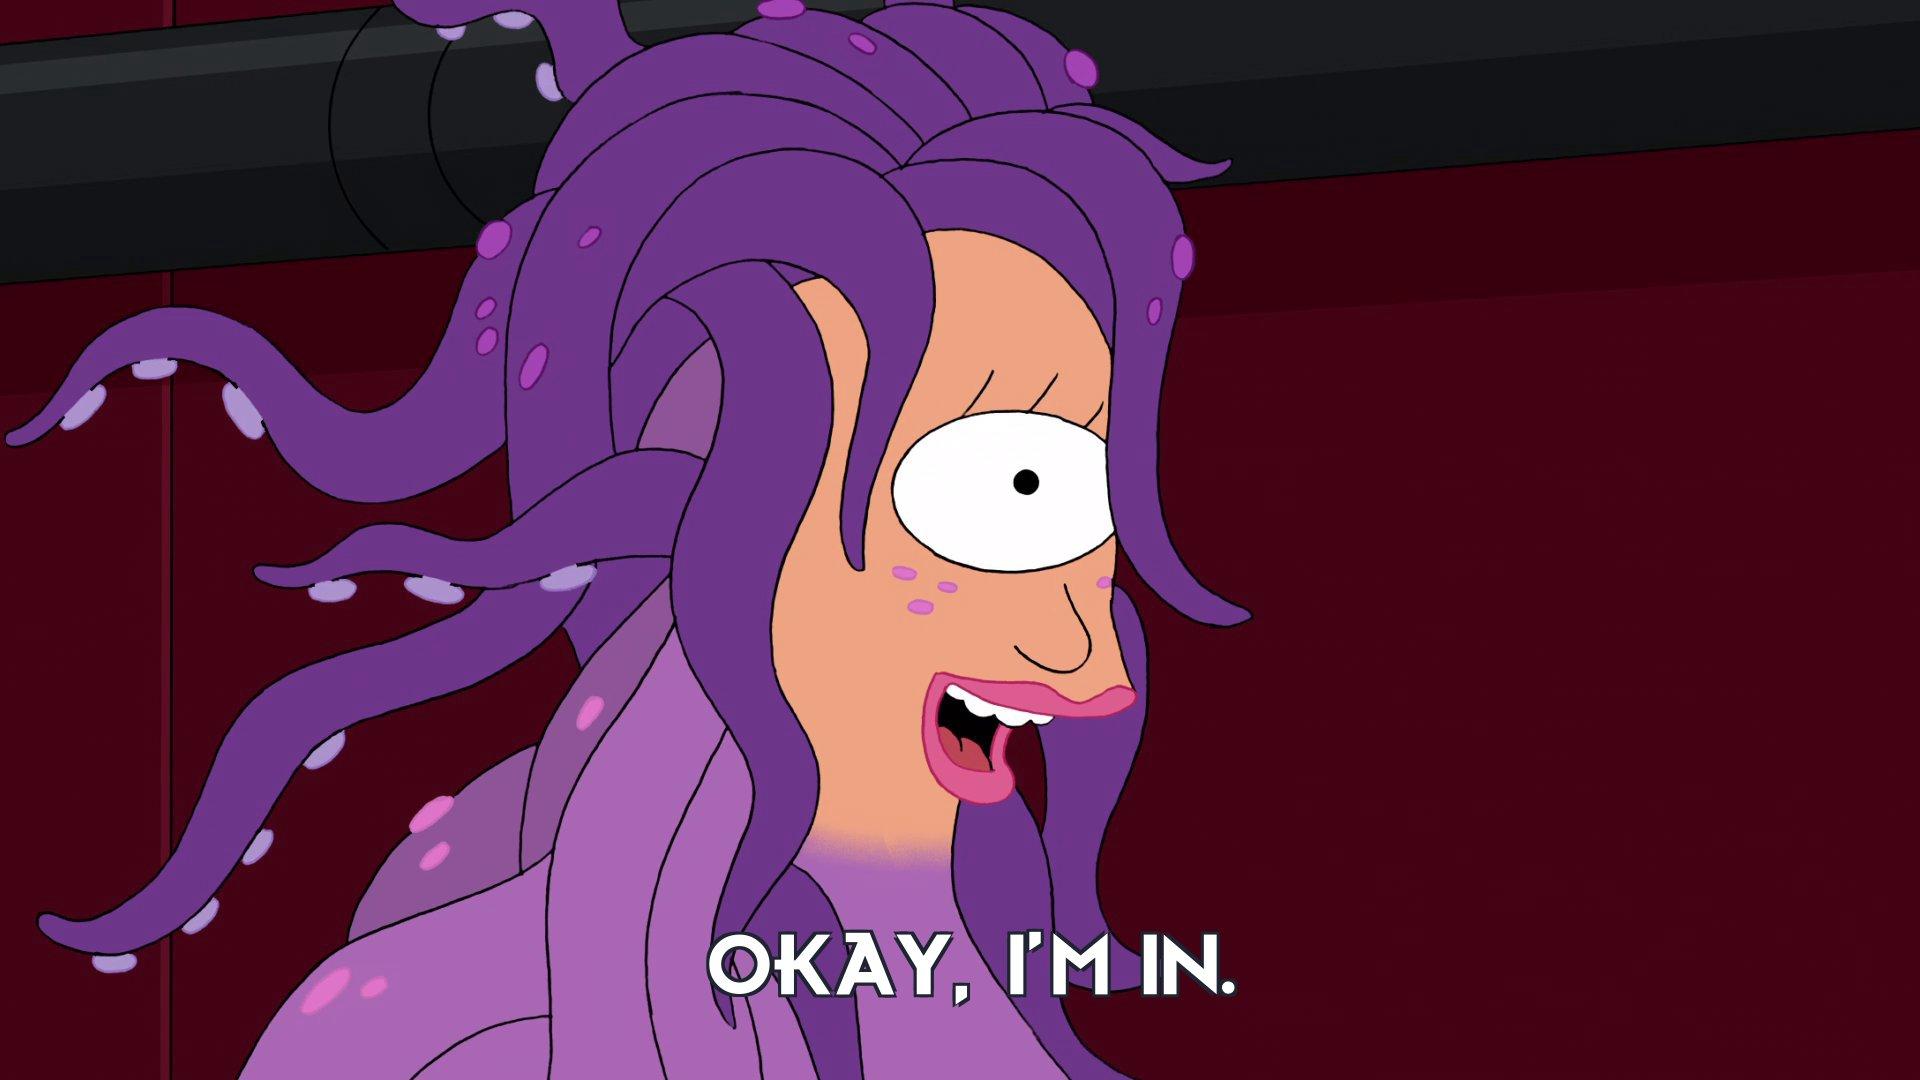 Turanga Leela: Okay, I'm in.